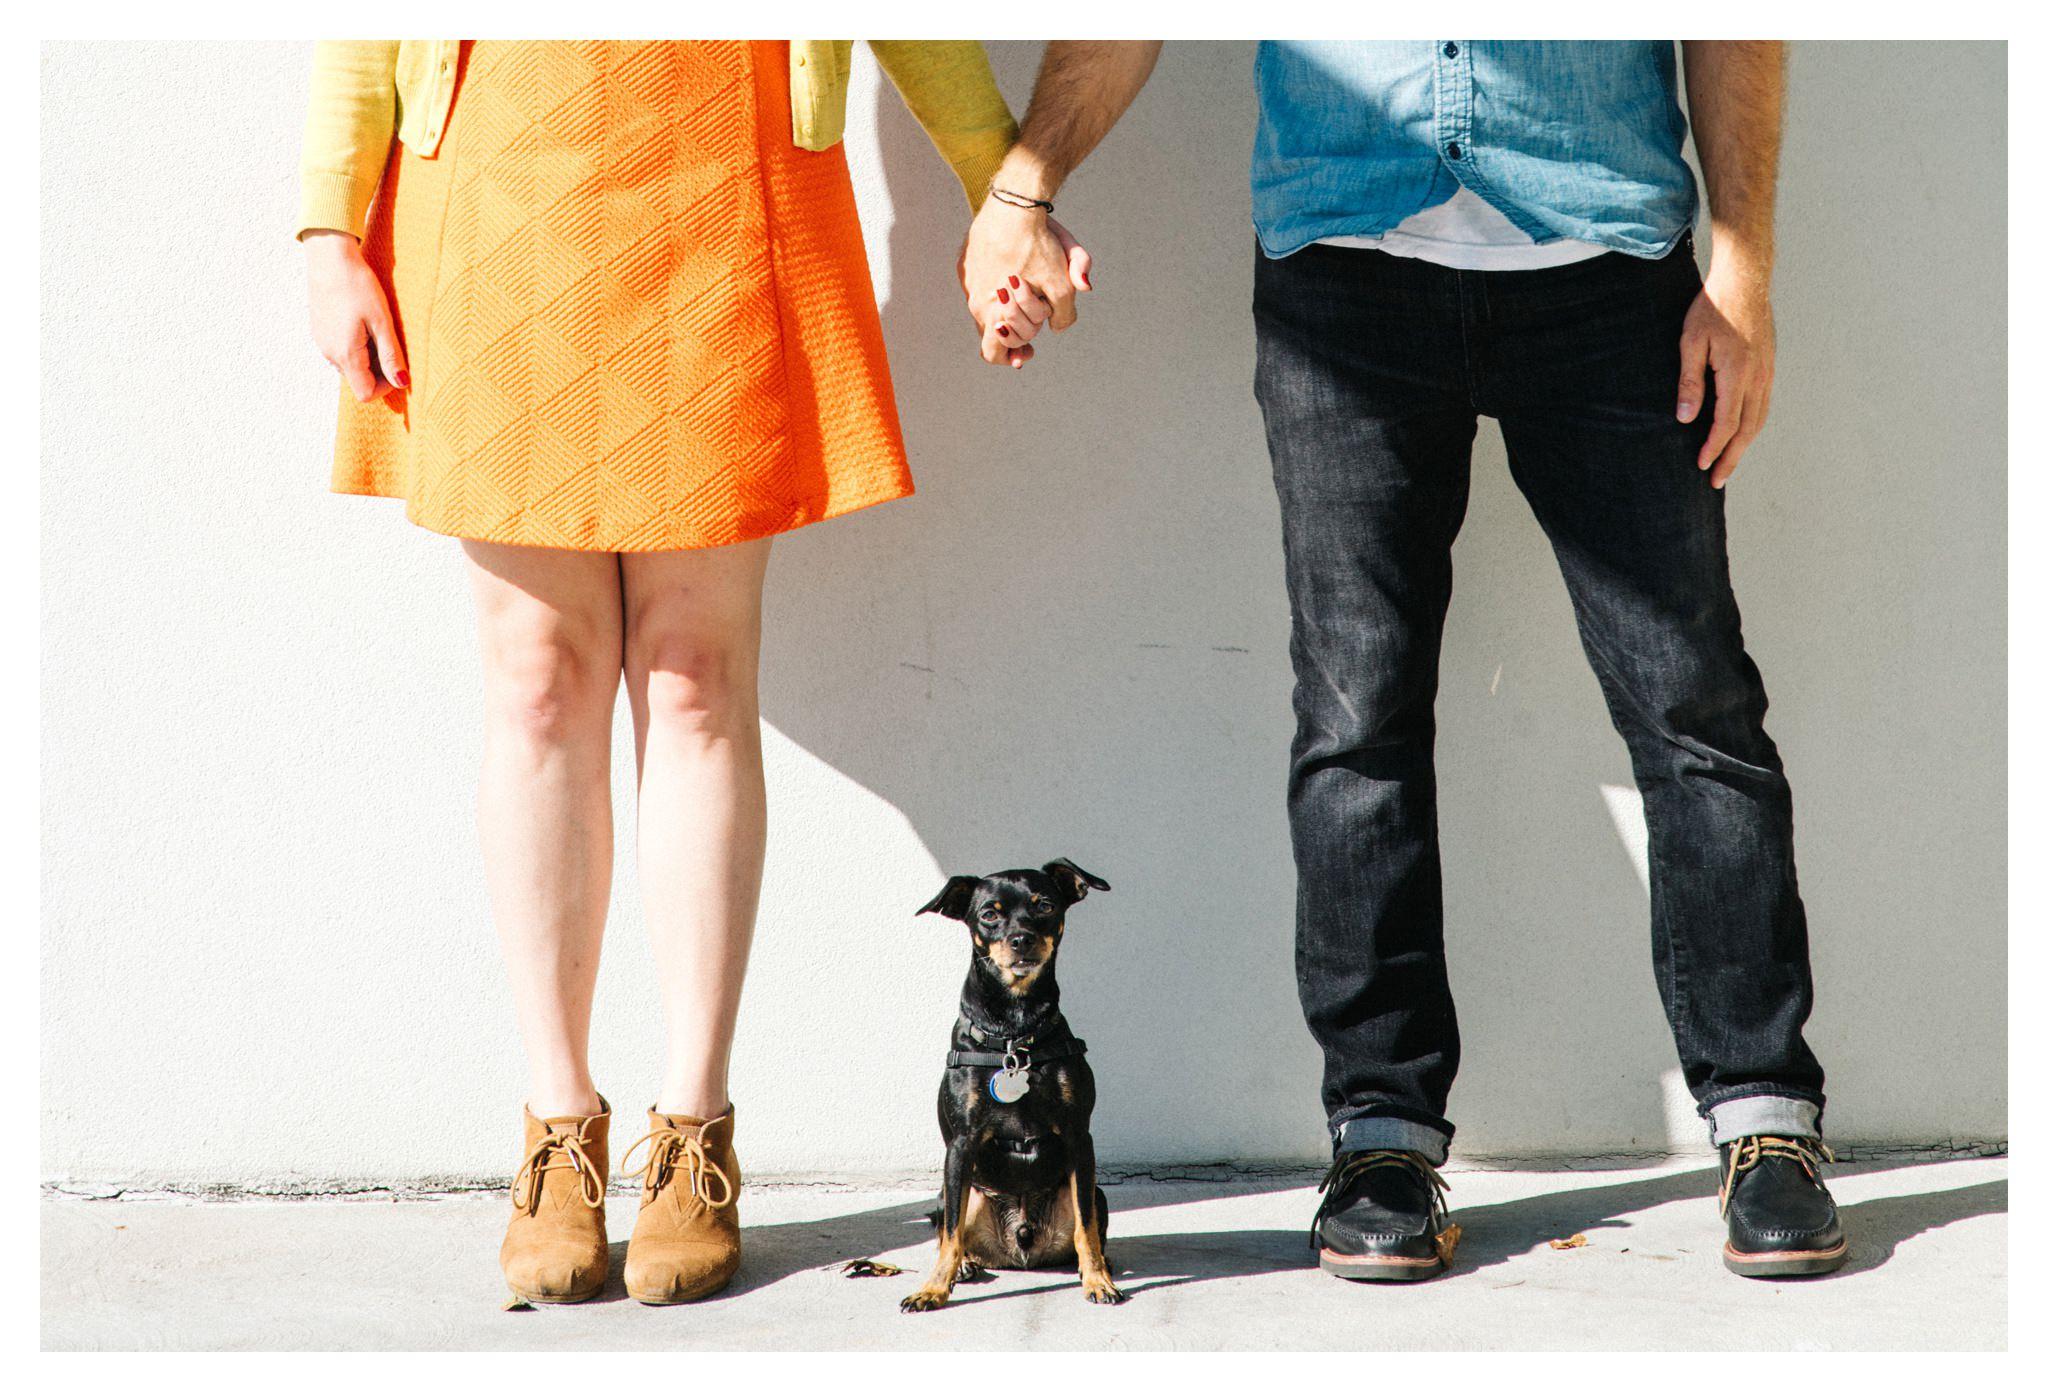 North_Park_San_Diego_Engagement_0009.jpg